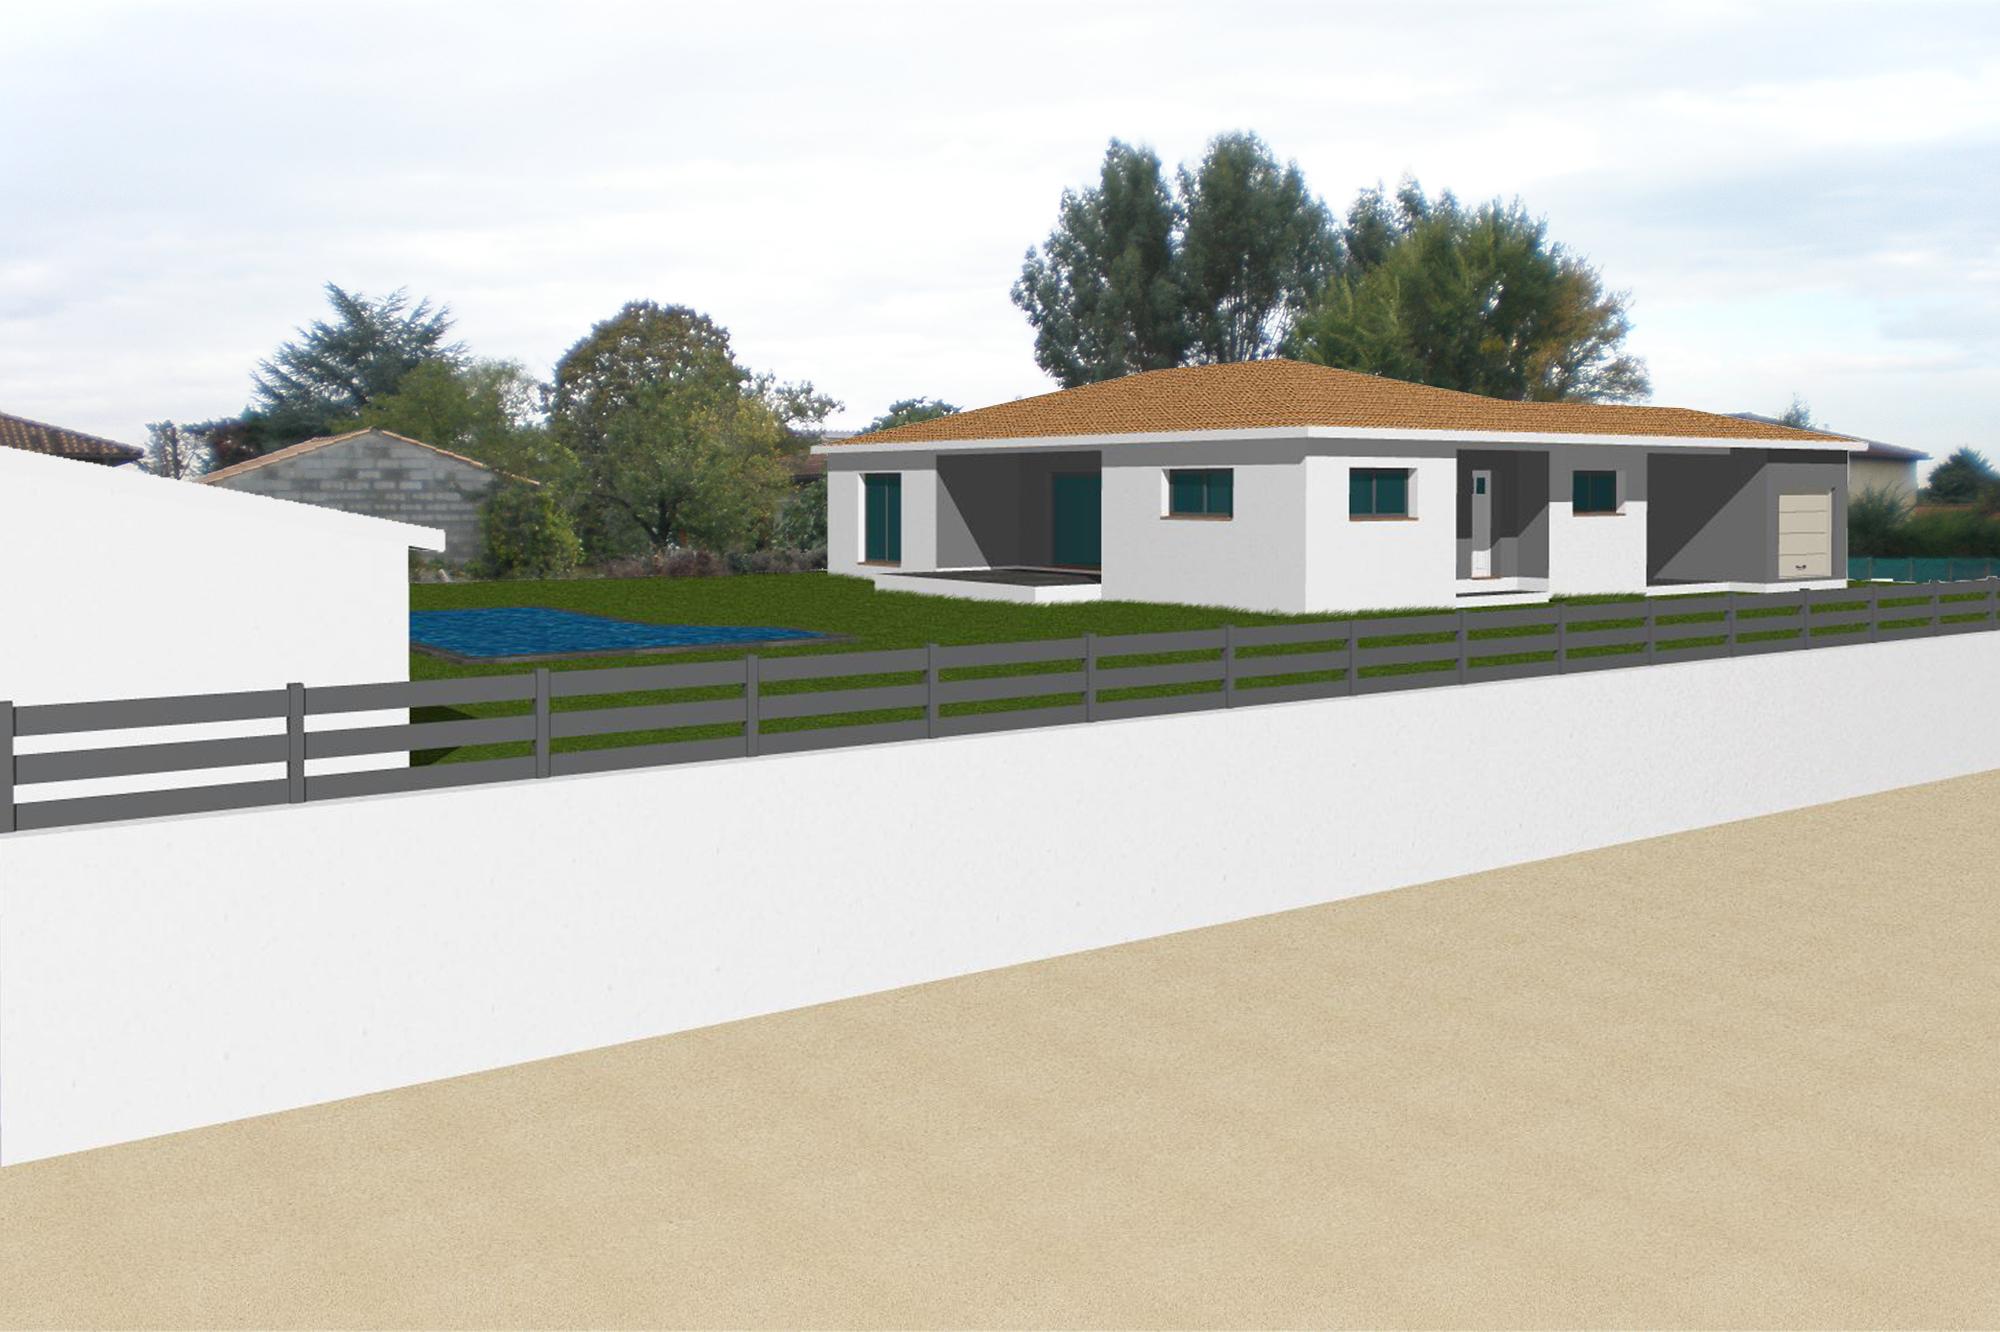 Permis de construire sur la commune de seysses pr s de - Construire une entree de maison ...